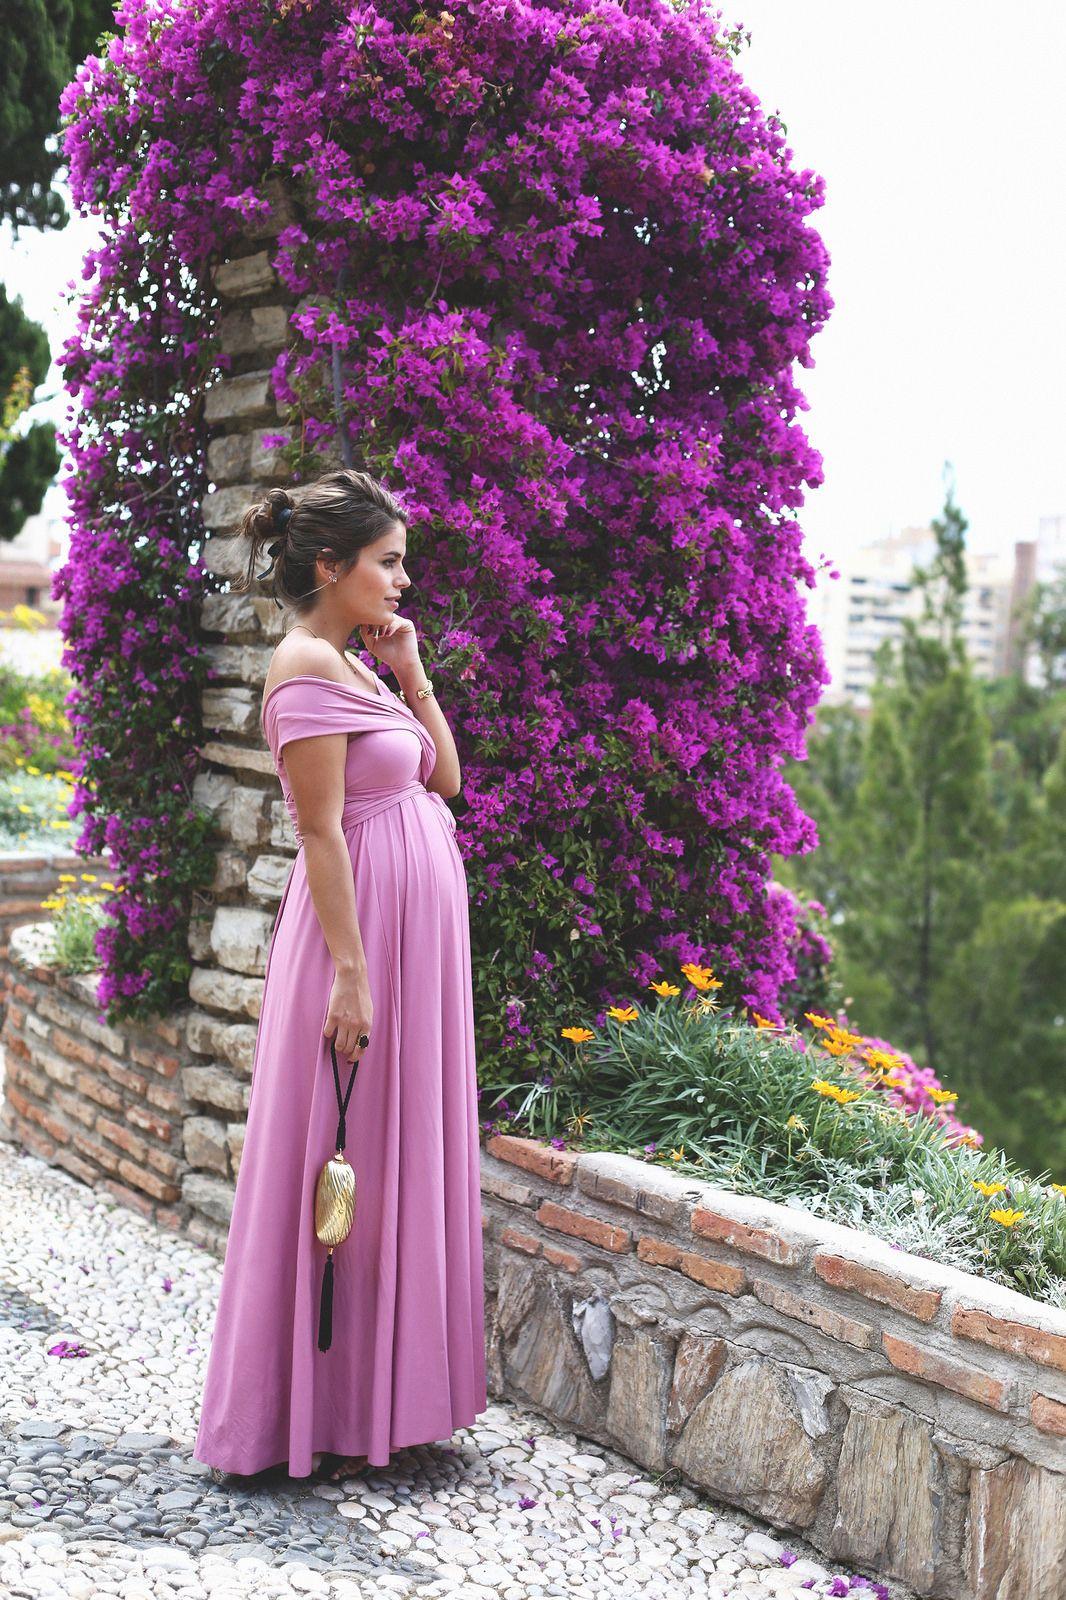 pregnancy | maternity outfits | vestido rojo carmesi cotton candy ...